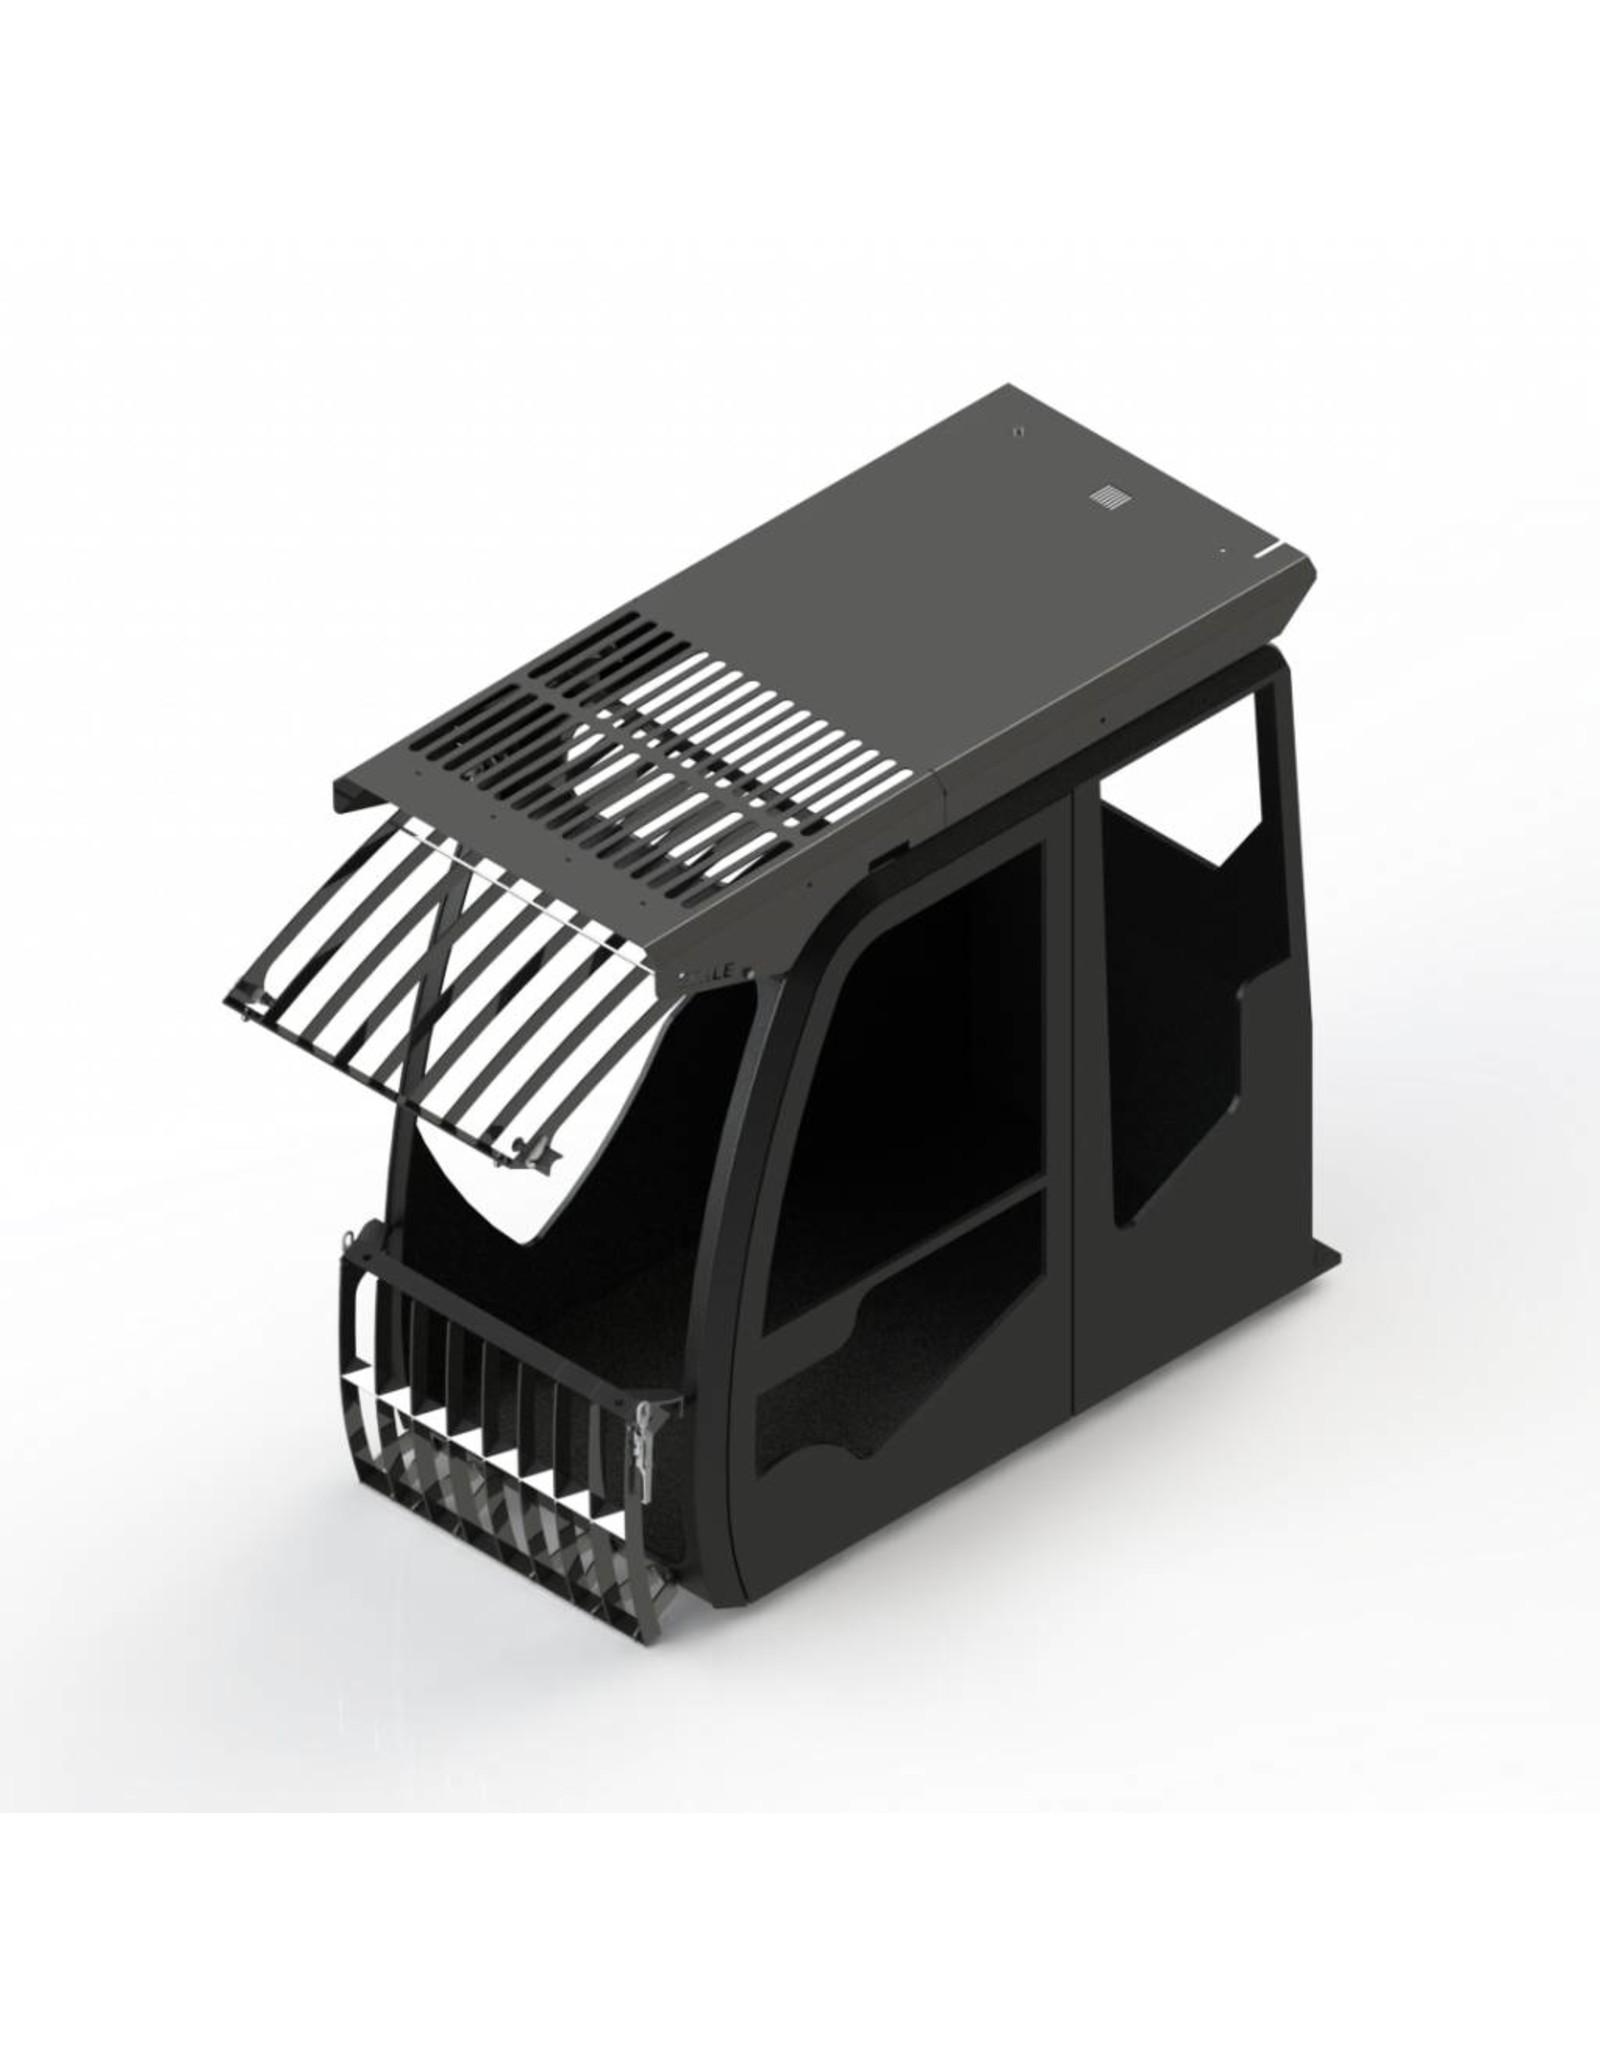 Echle Hartstahl GmbH FOPS für JCB JS160LC